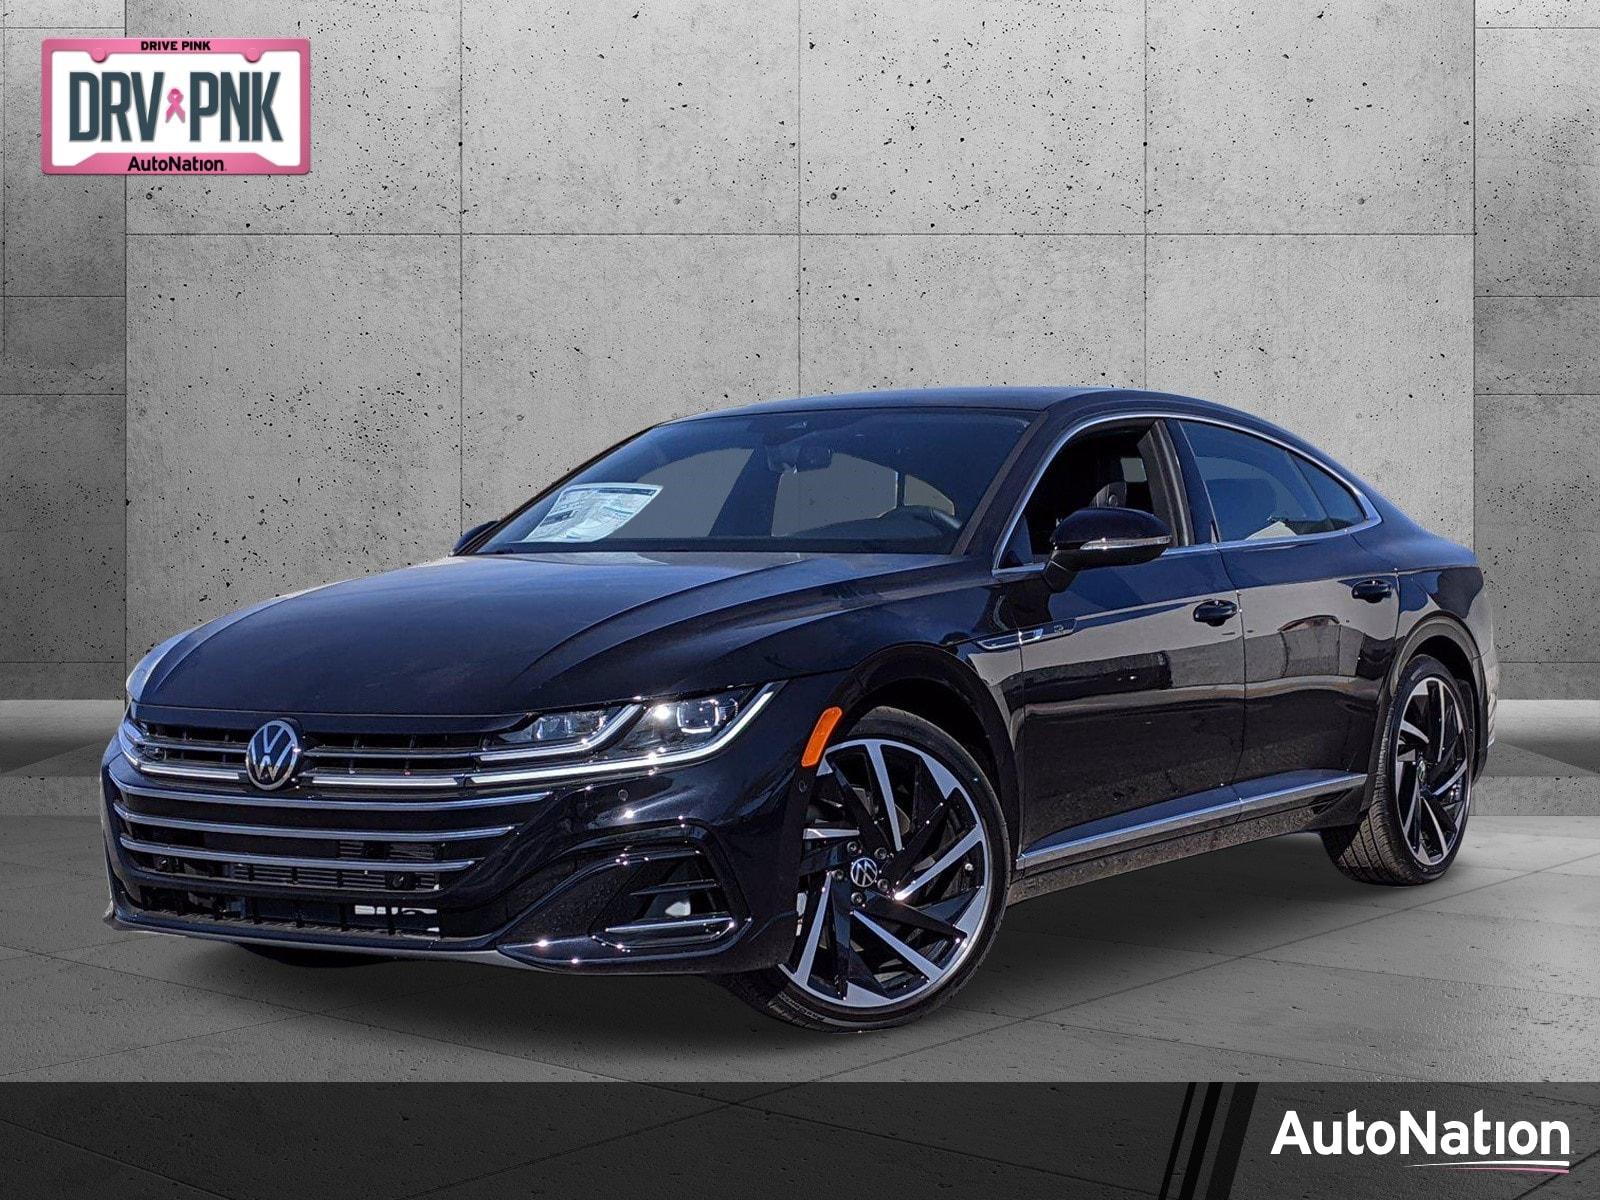 2021 Volkswagen Arteon 2.0T SEL Premium R-Line 4MOTION Sedan